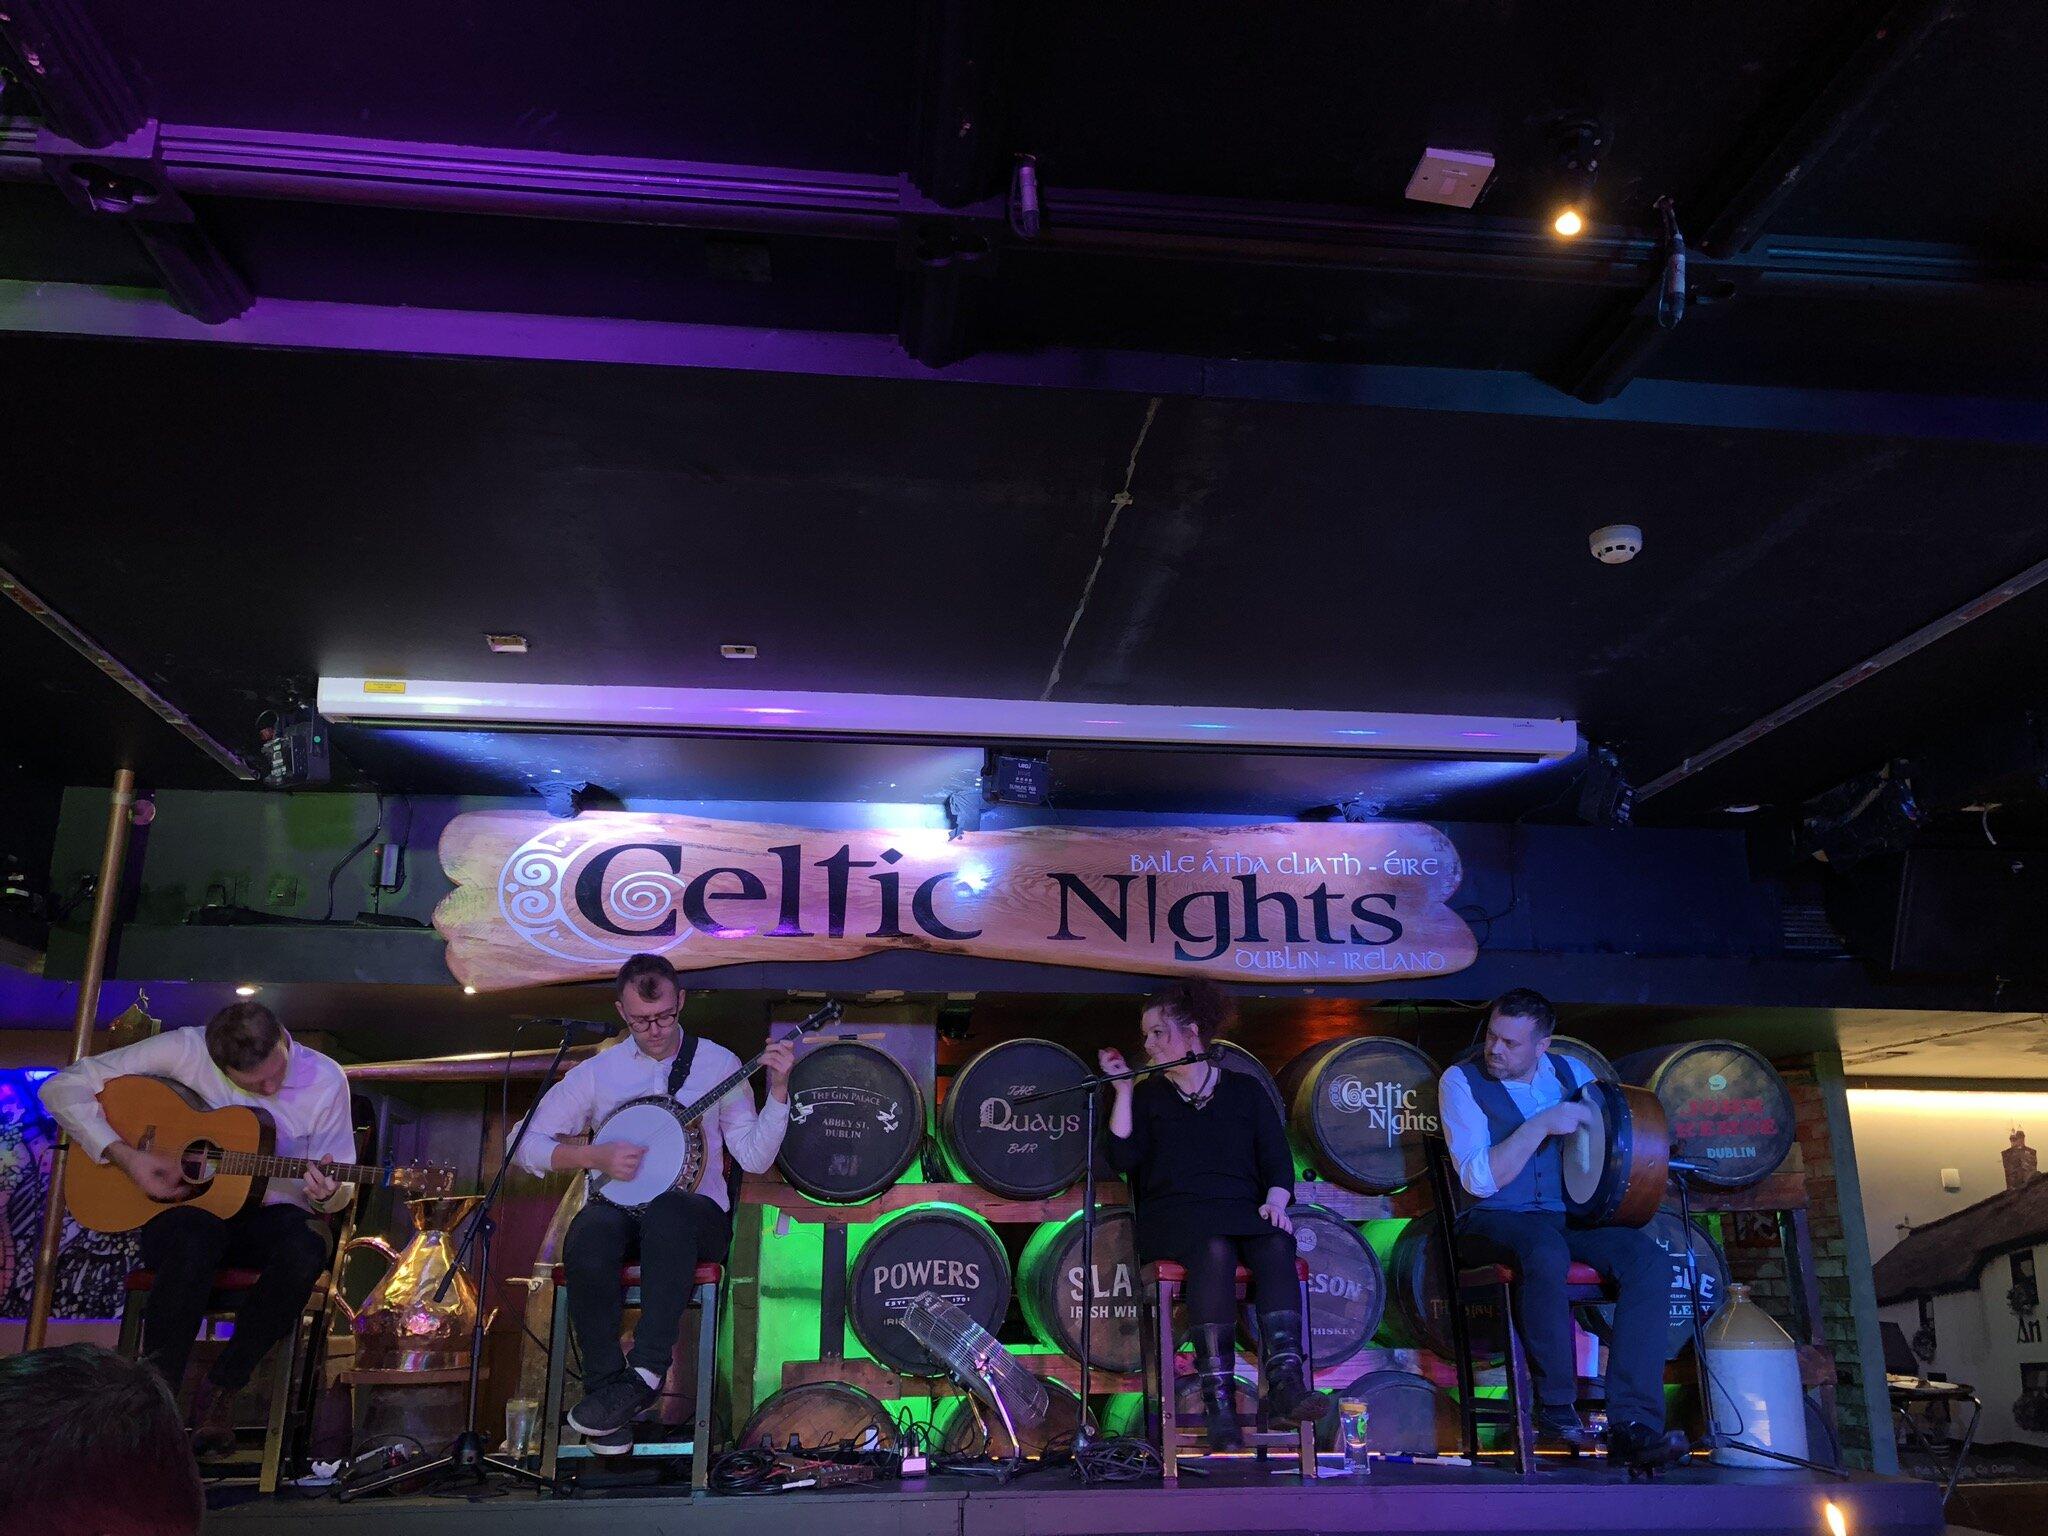 Celtic Nights live music at the Arlington Hotel restaurant in Dublin.